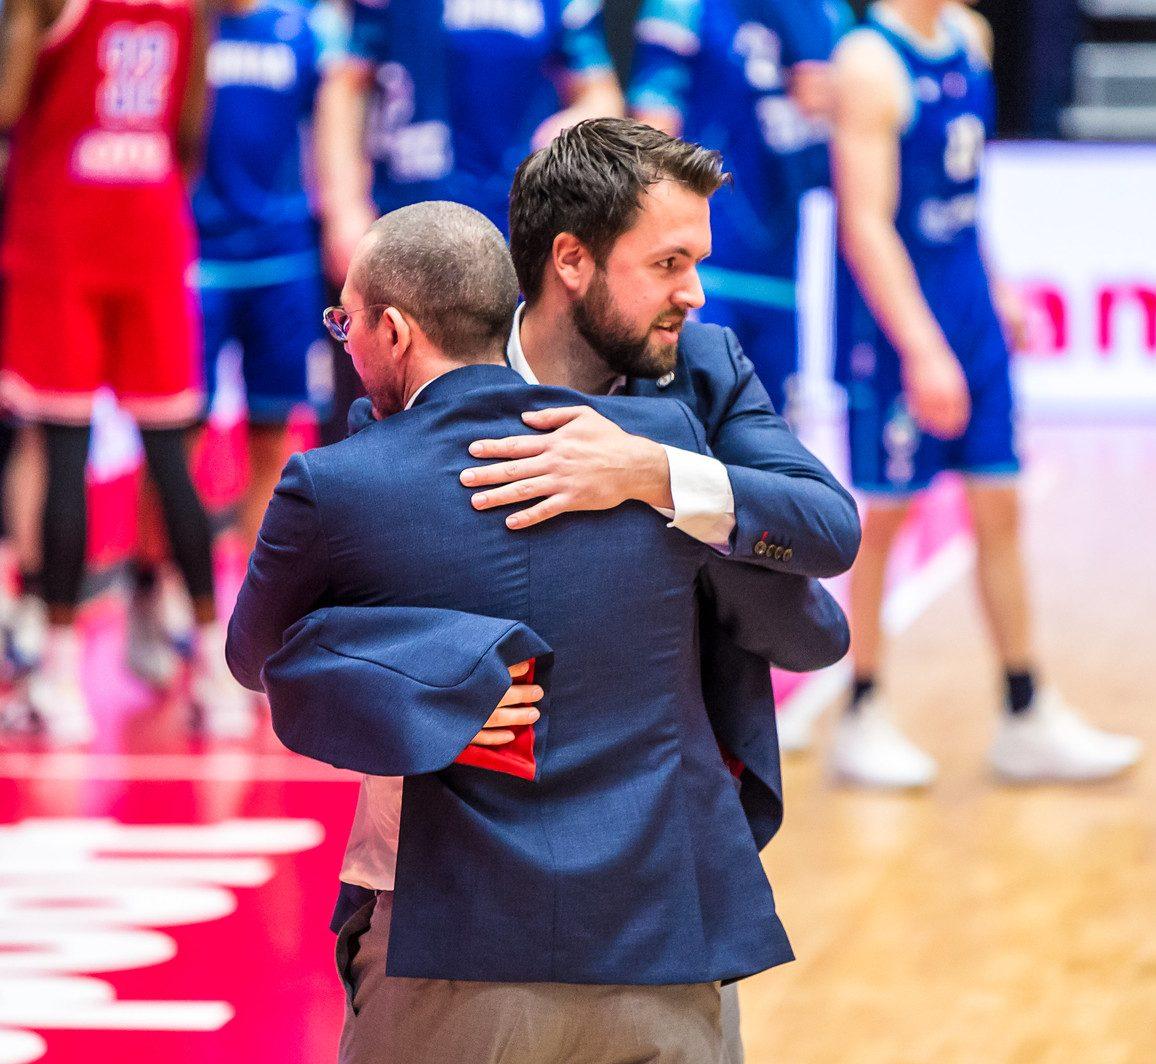 Wegen Jeroen van Vugt en Heroes Basketball Academy Den Bosch scheiden